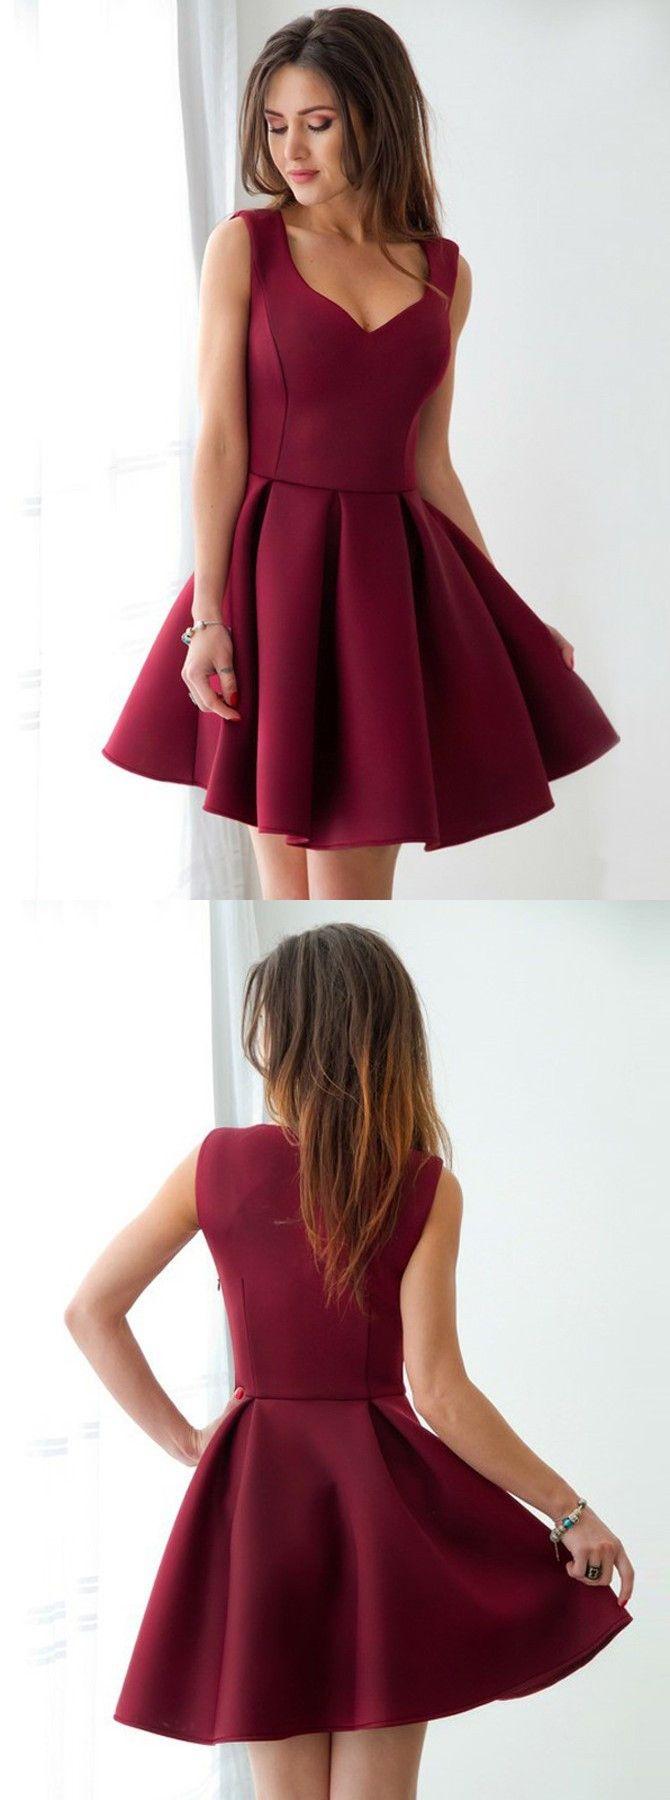 Aline scoop short pleated dark red satin homecoming dress dress